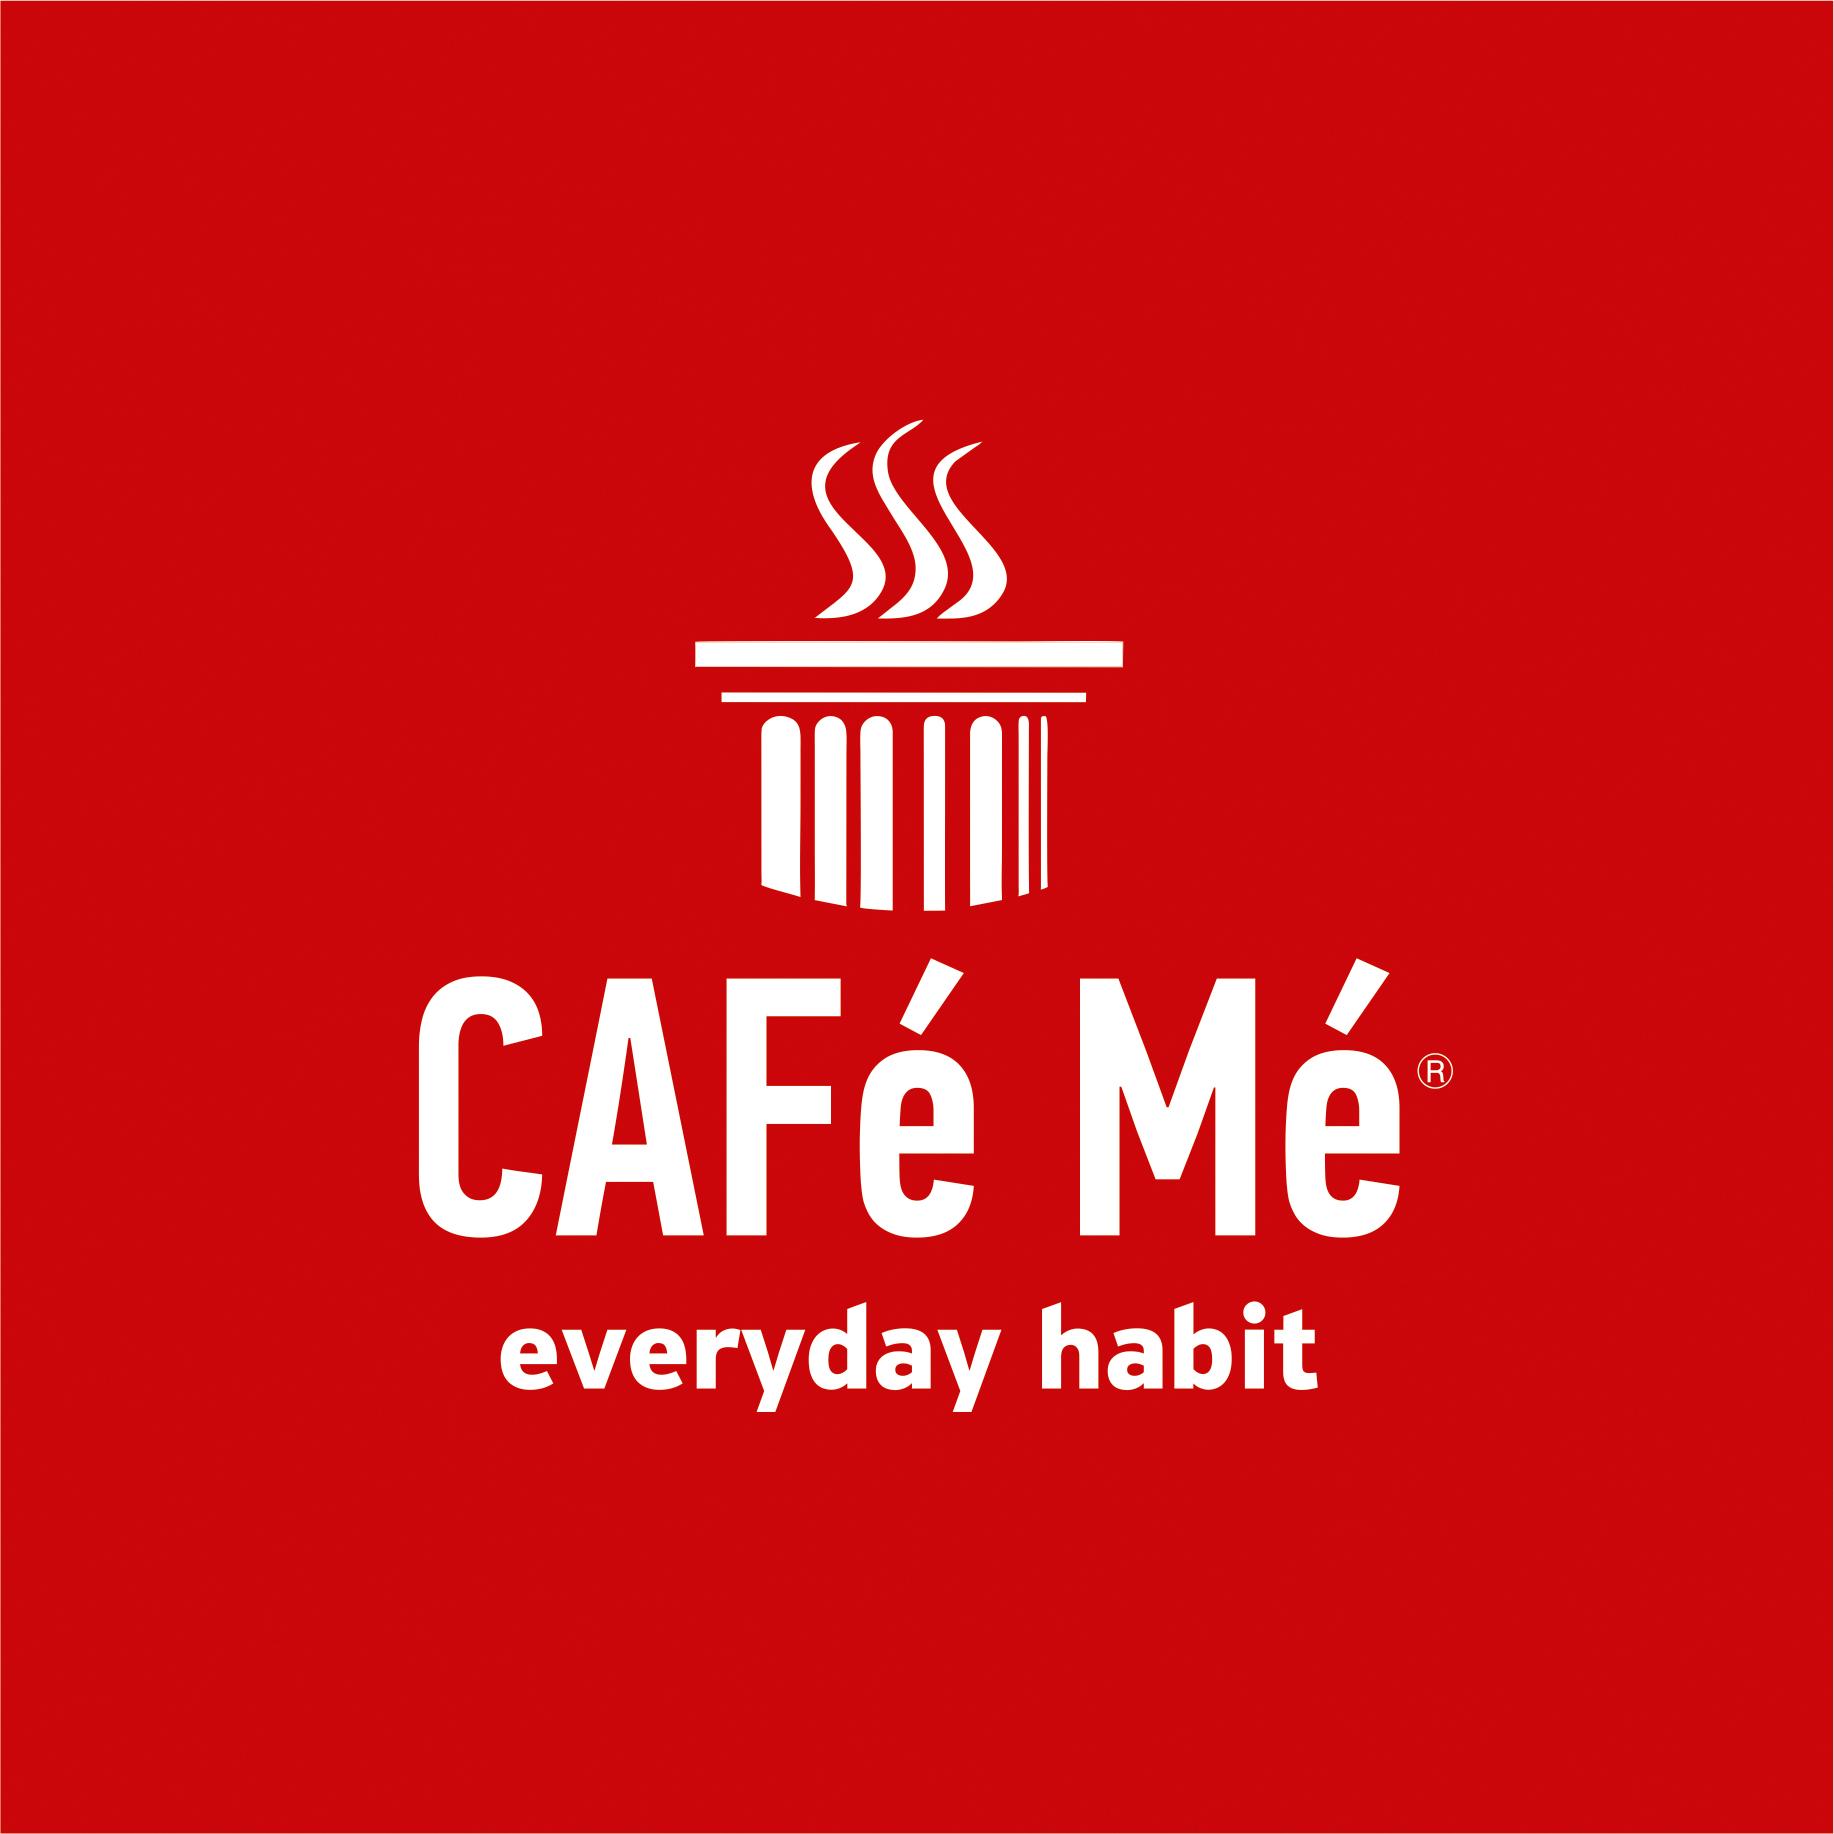 CafeMe